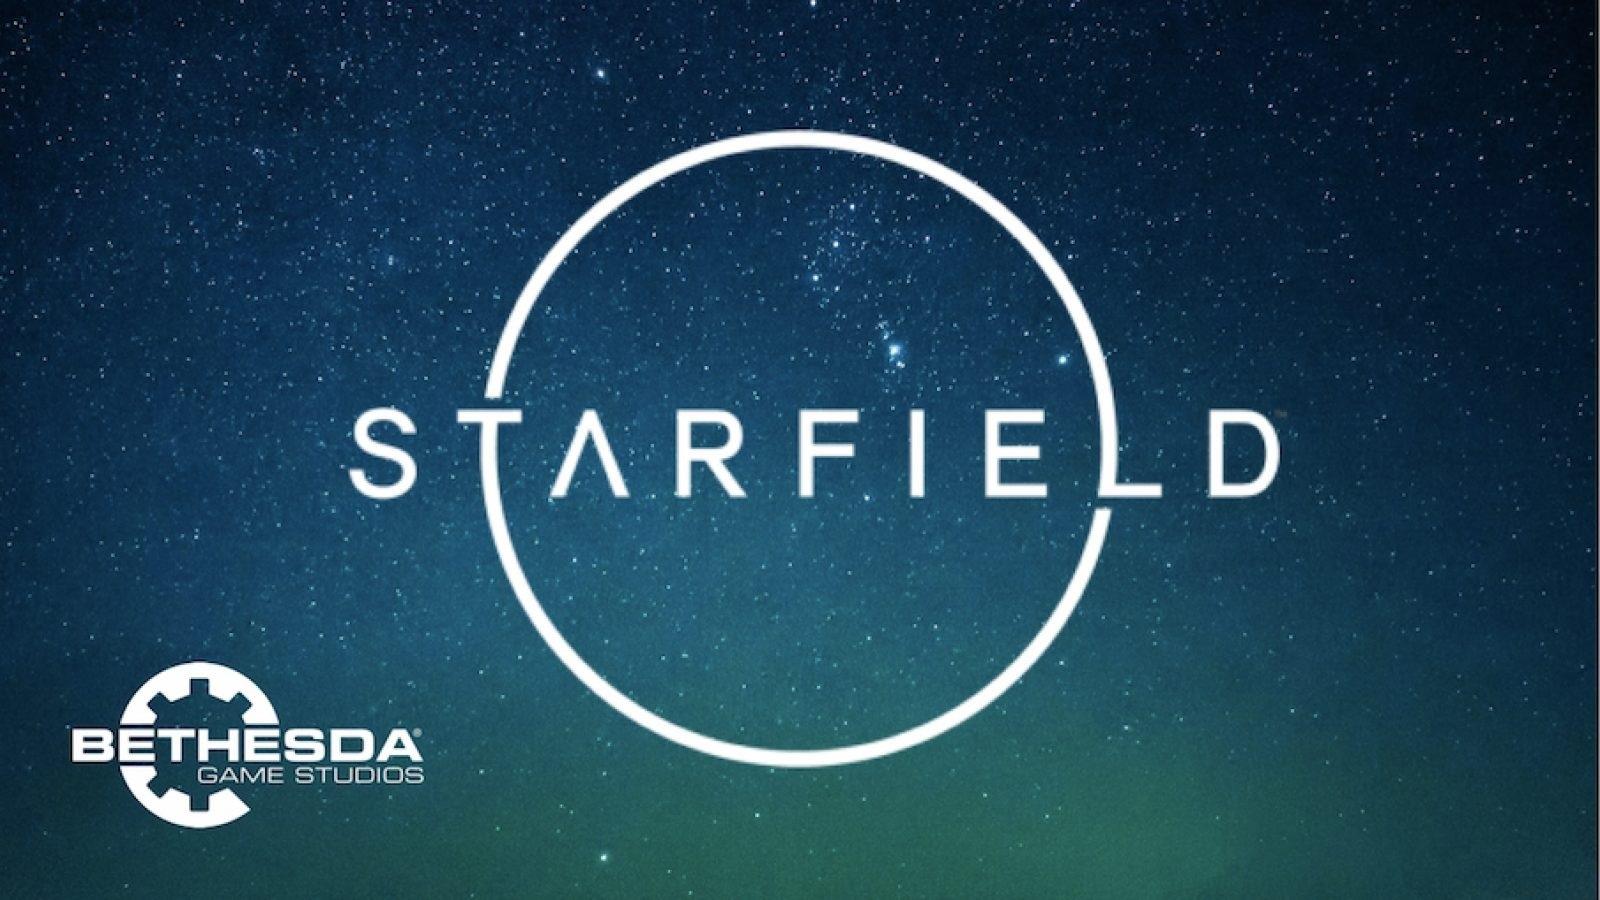 Starfield: screenshot: logo